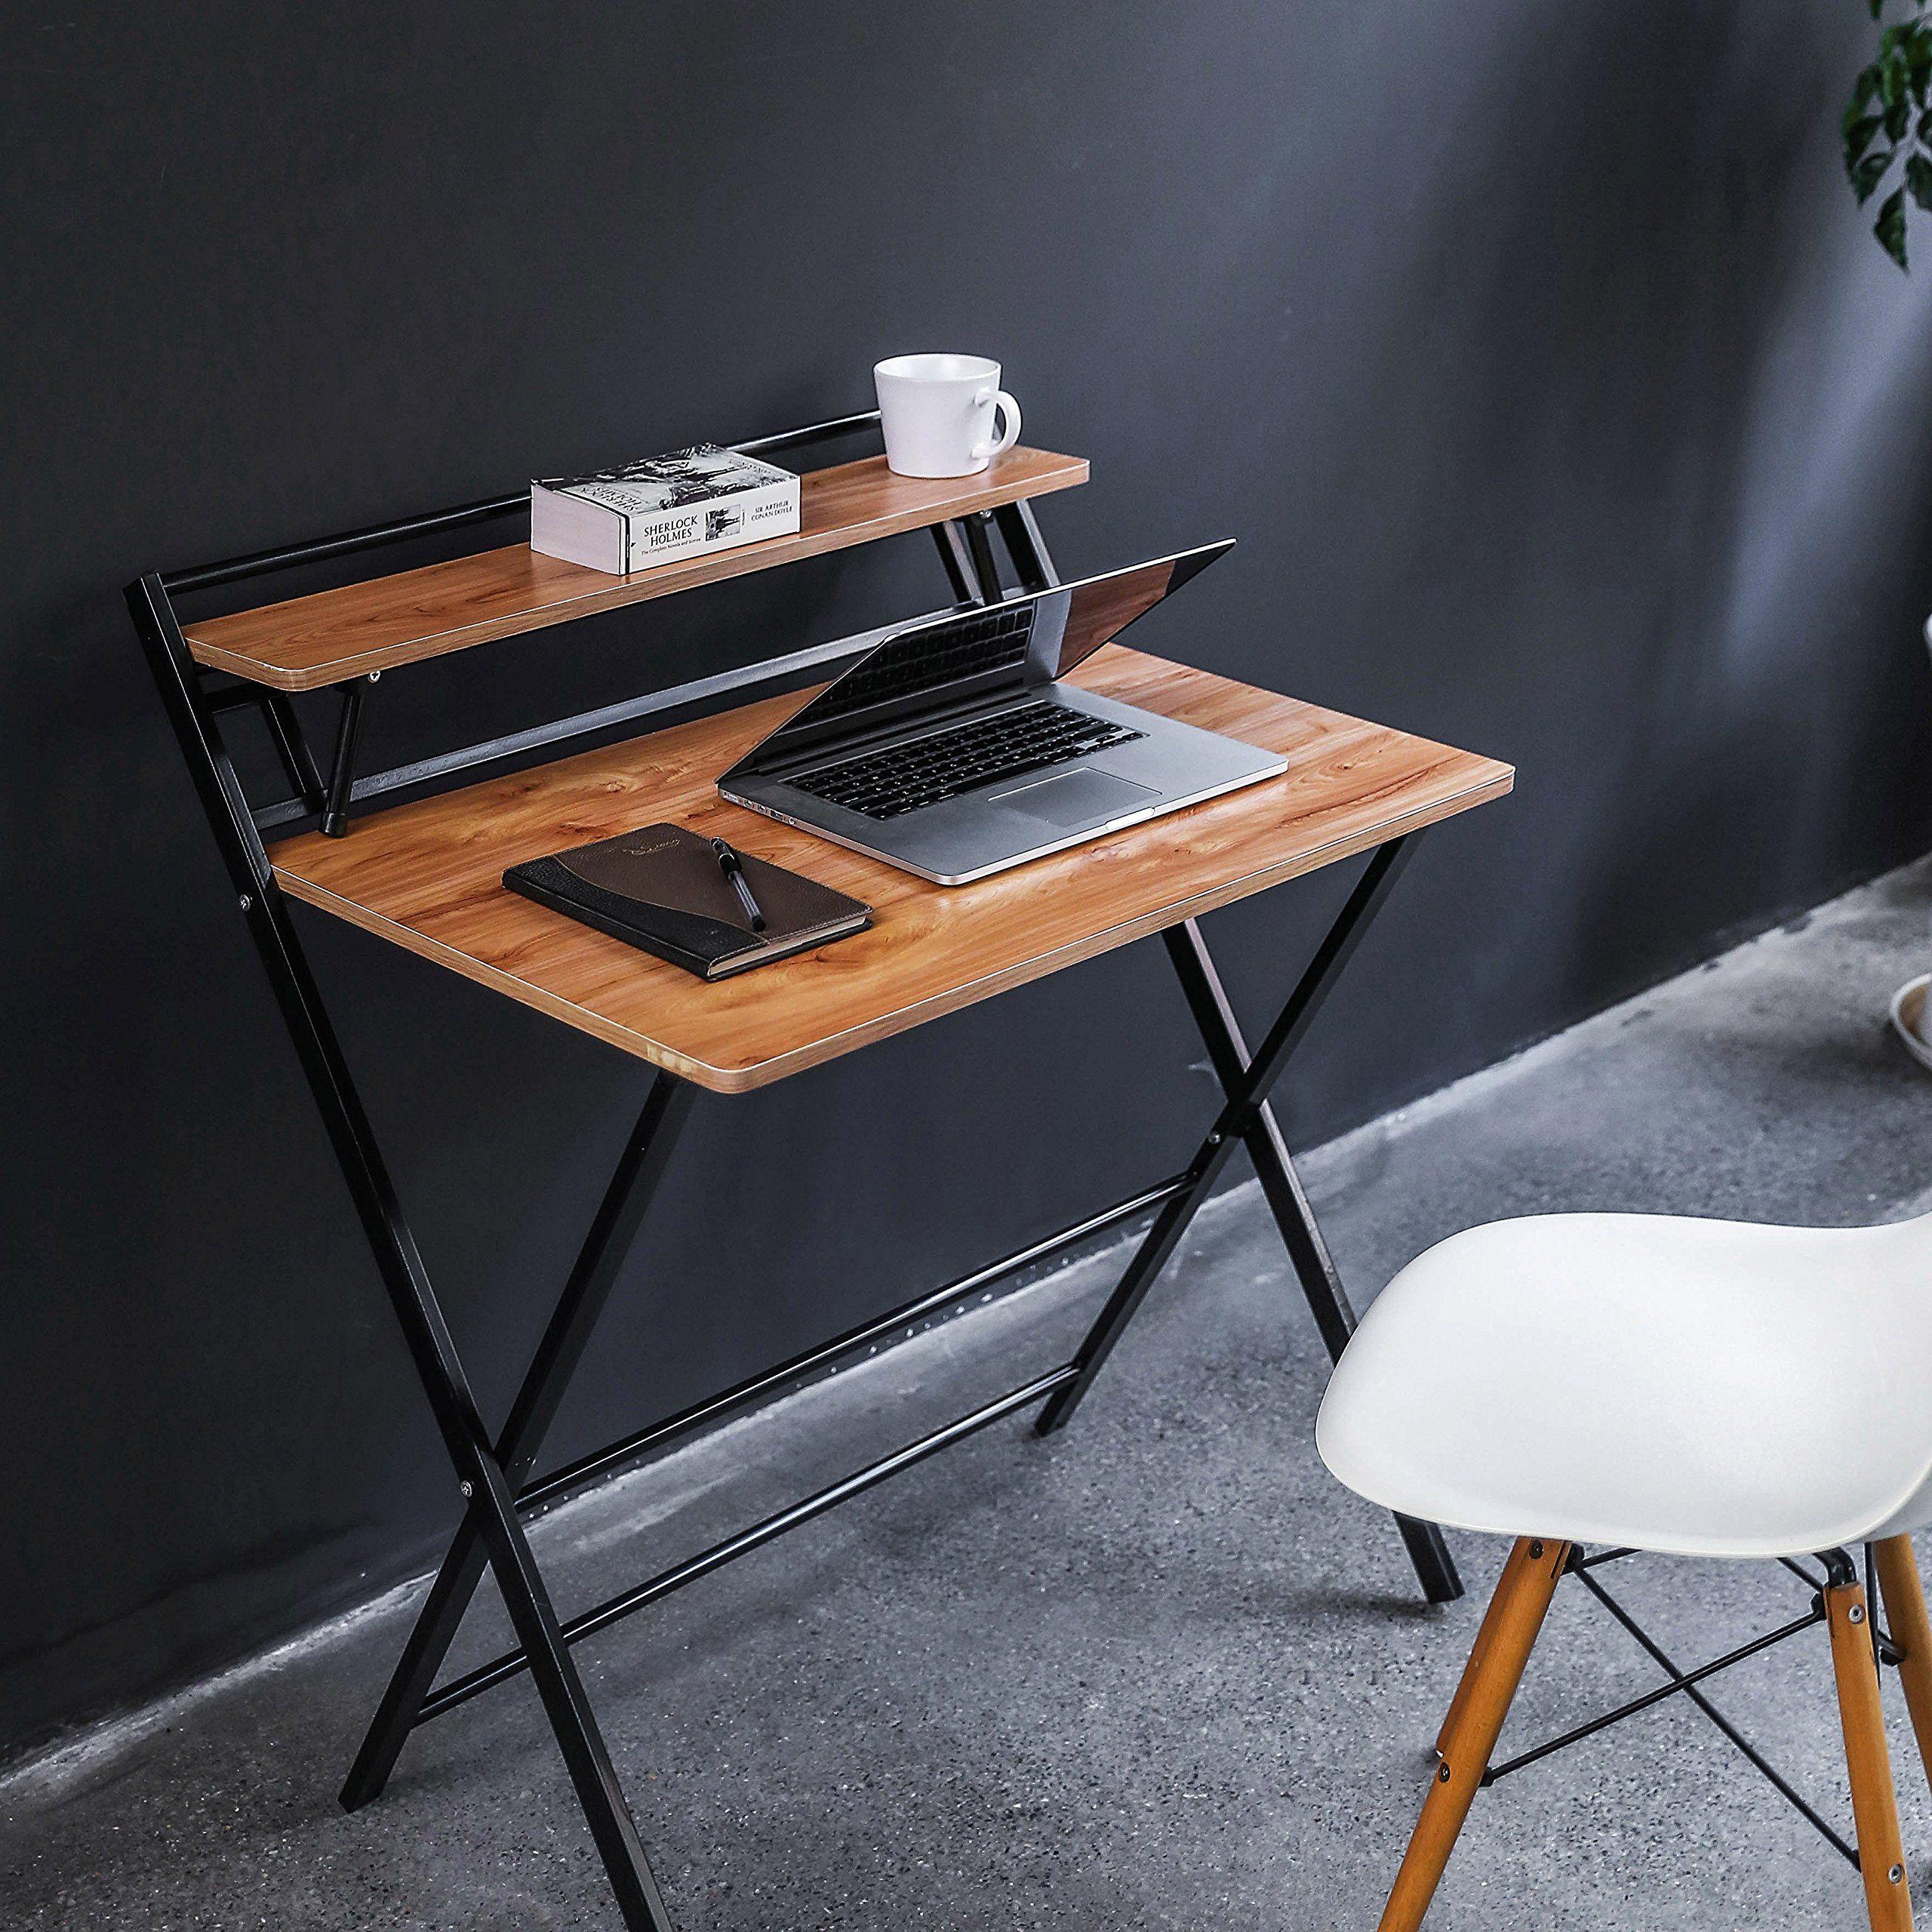 JIWU 2-Style Folding Desk For Small Space, Home Corner